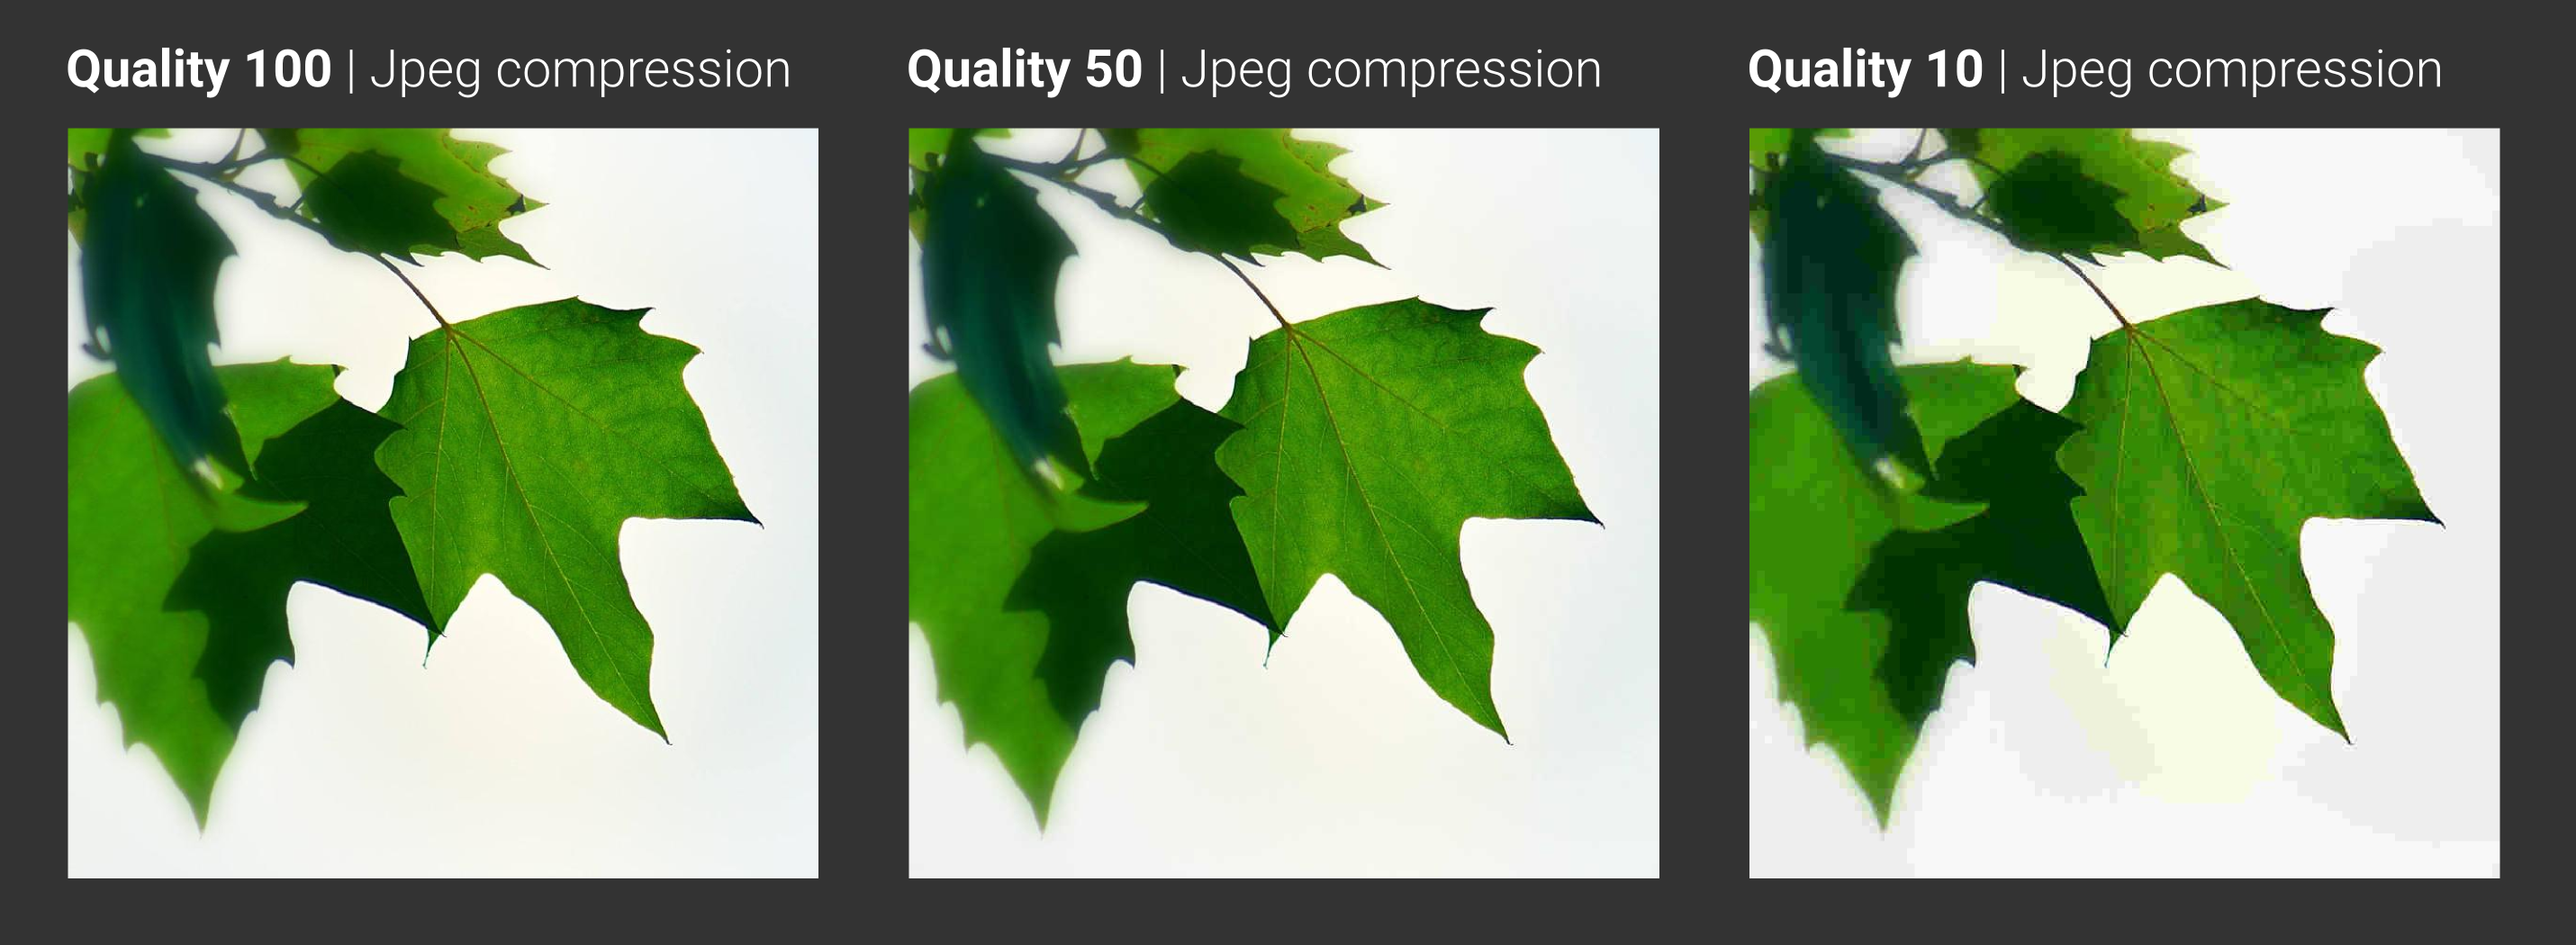 Jpg quality comparison